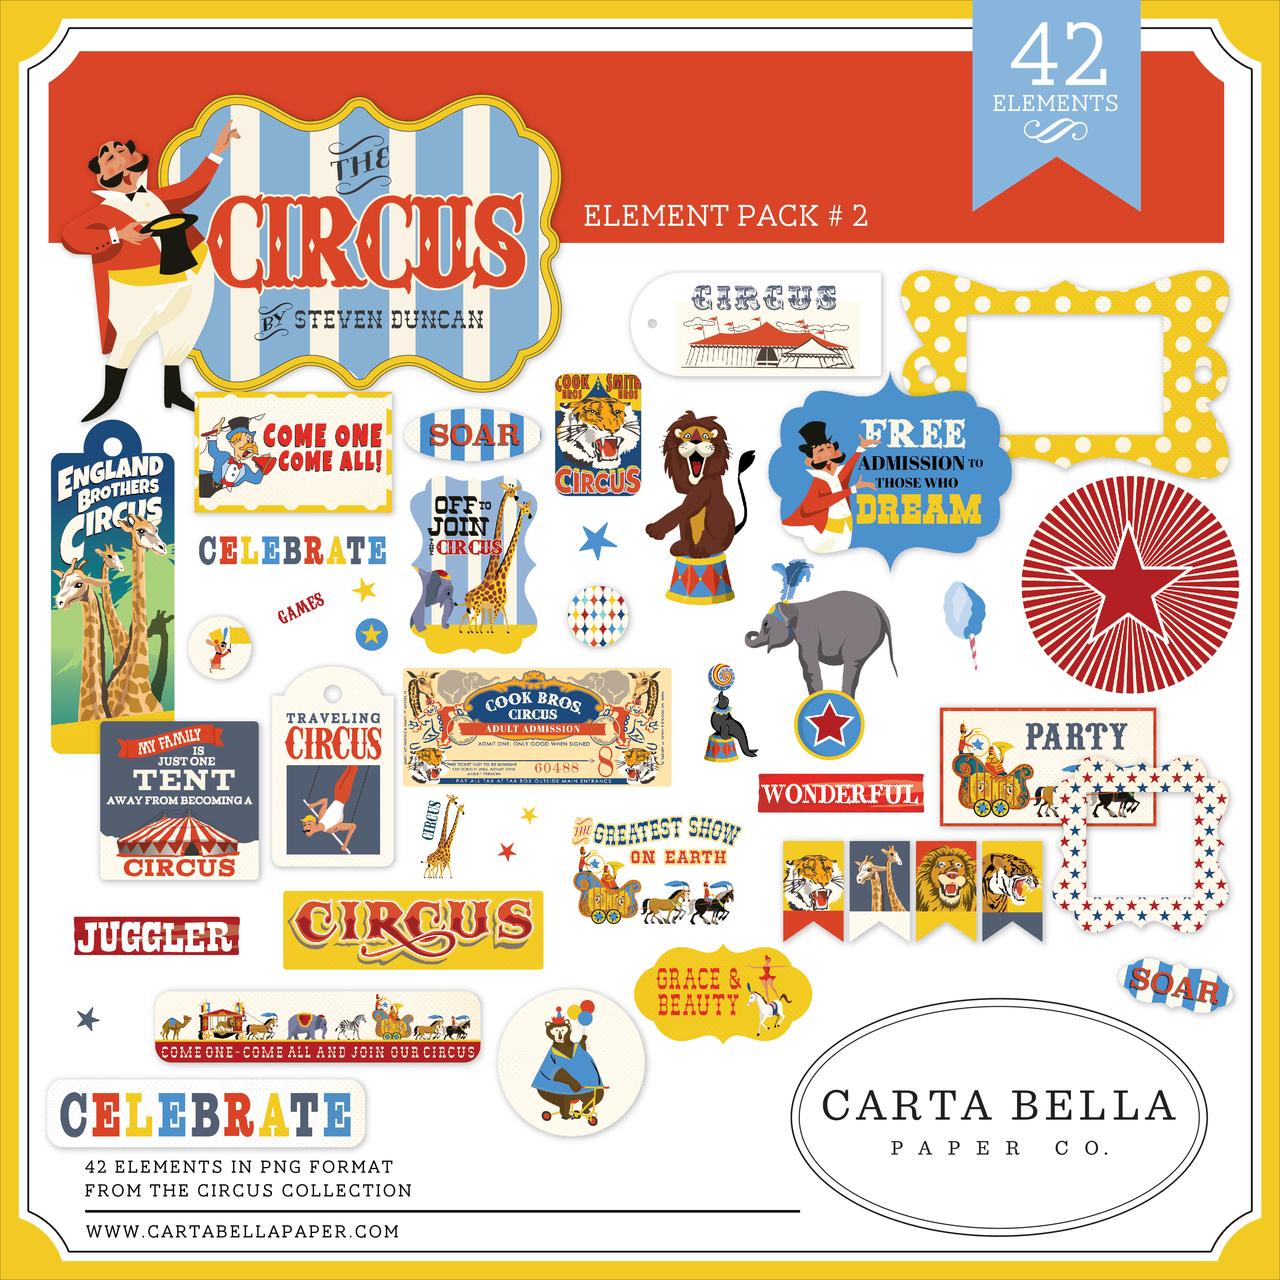 Circus Element Pack #2